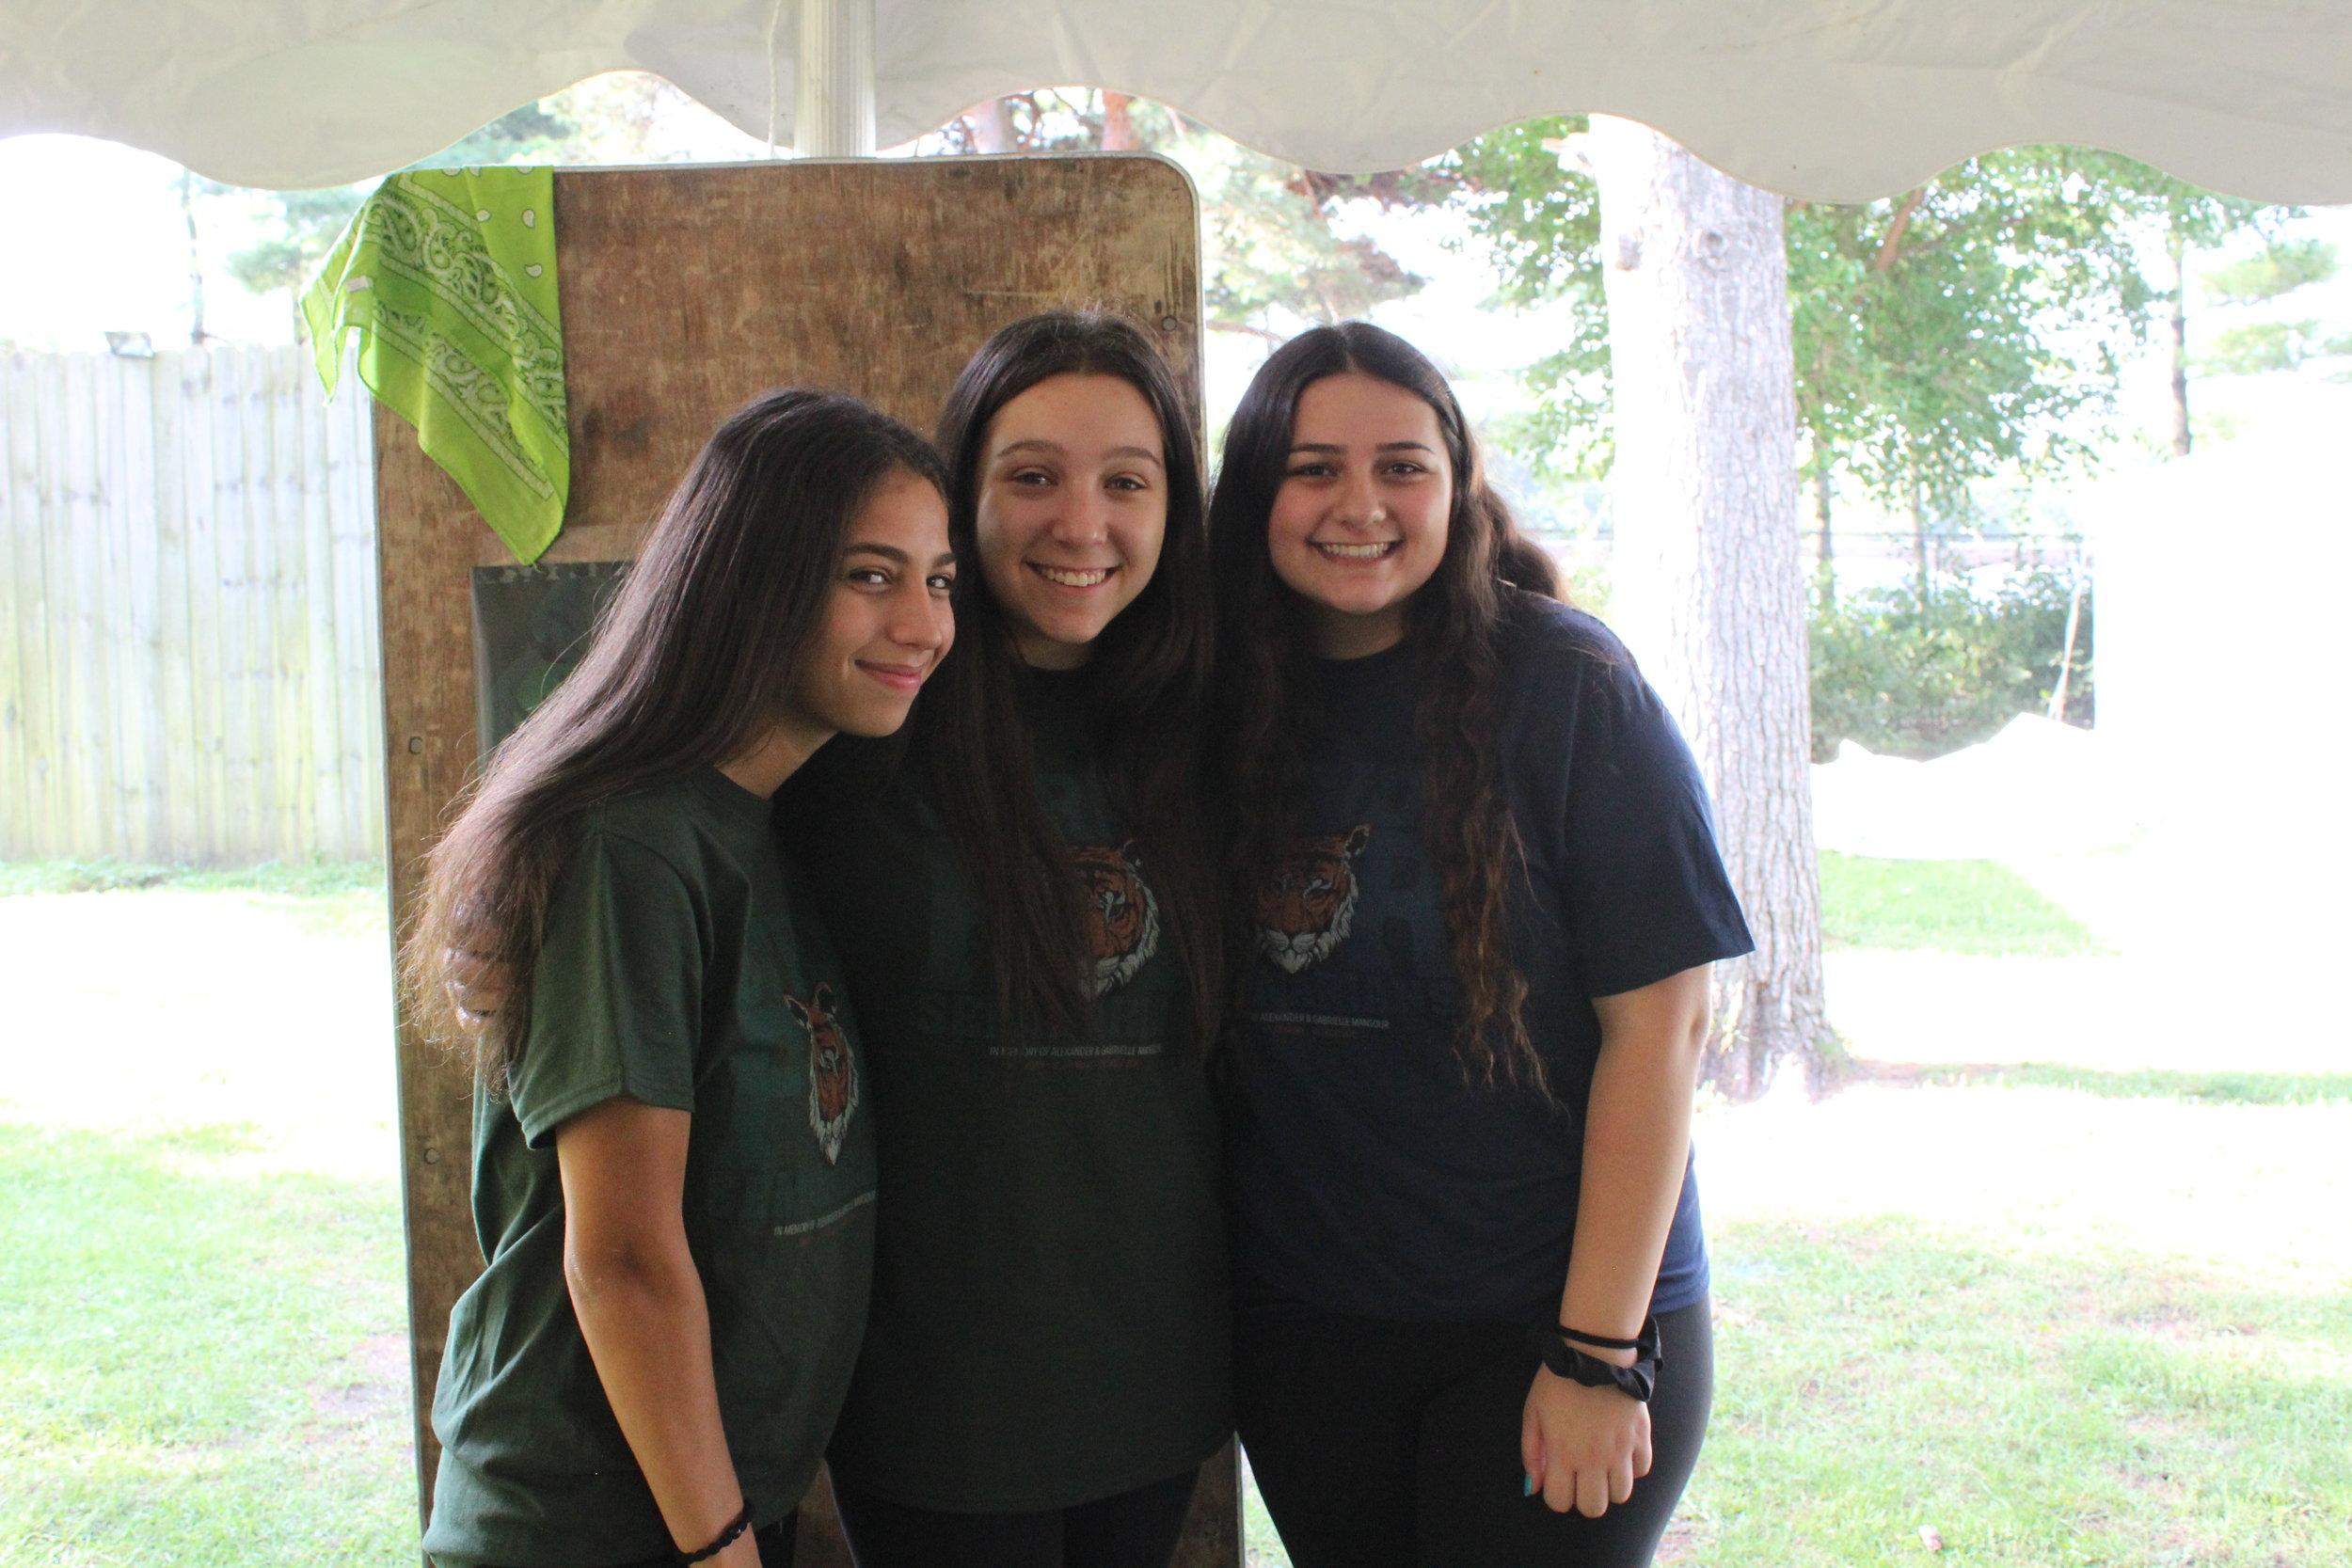 Hannah Konja, Madison Kajy, and Lana Kinaya